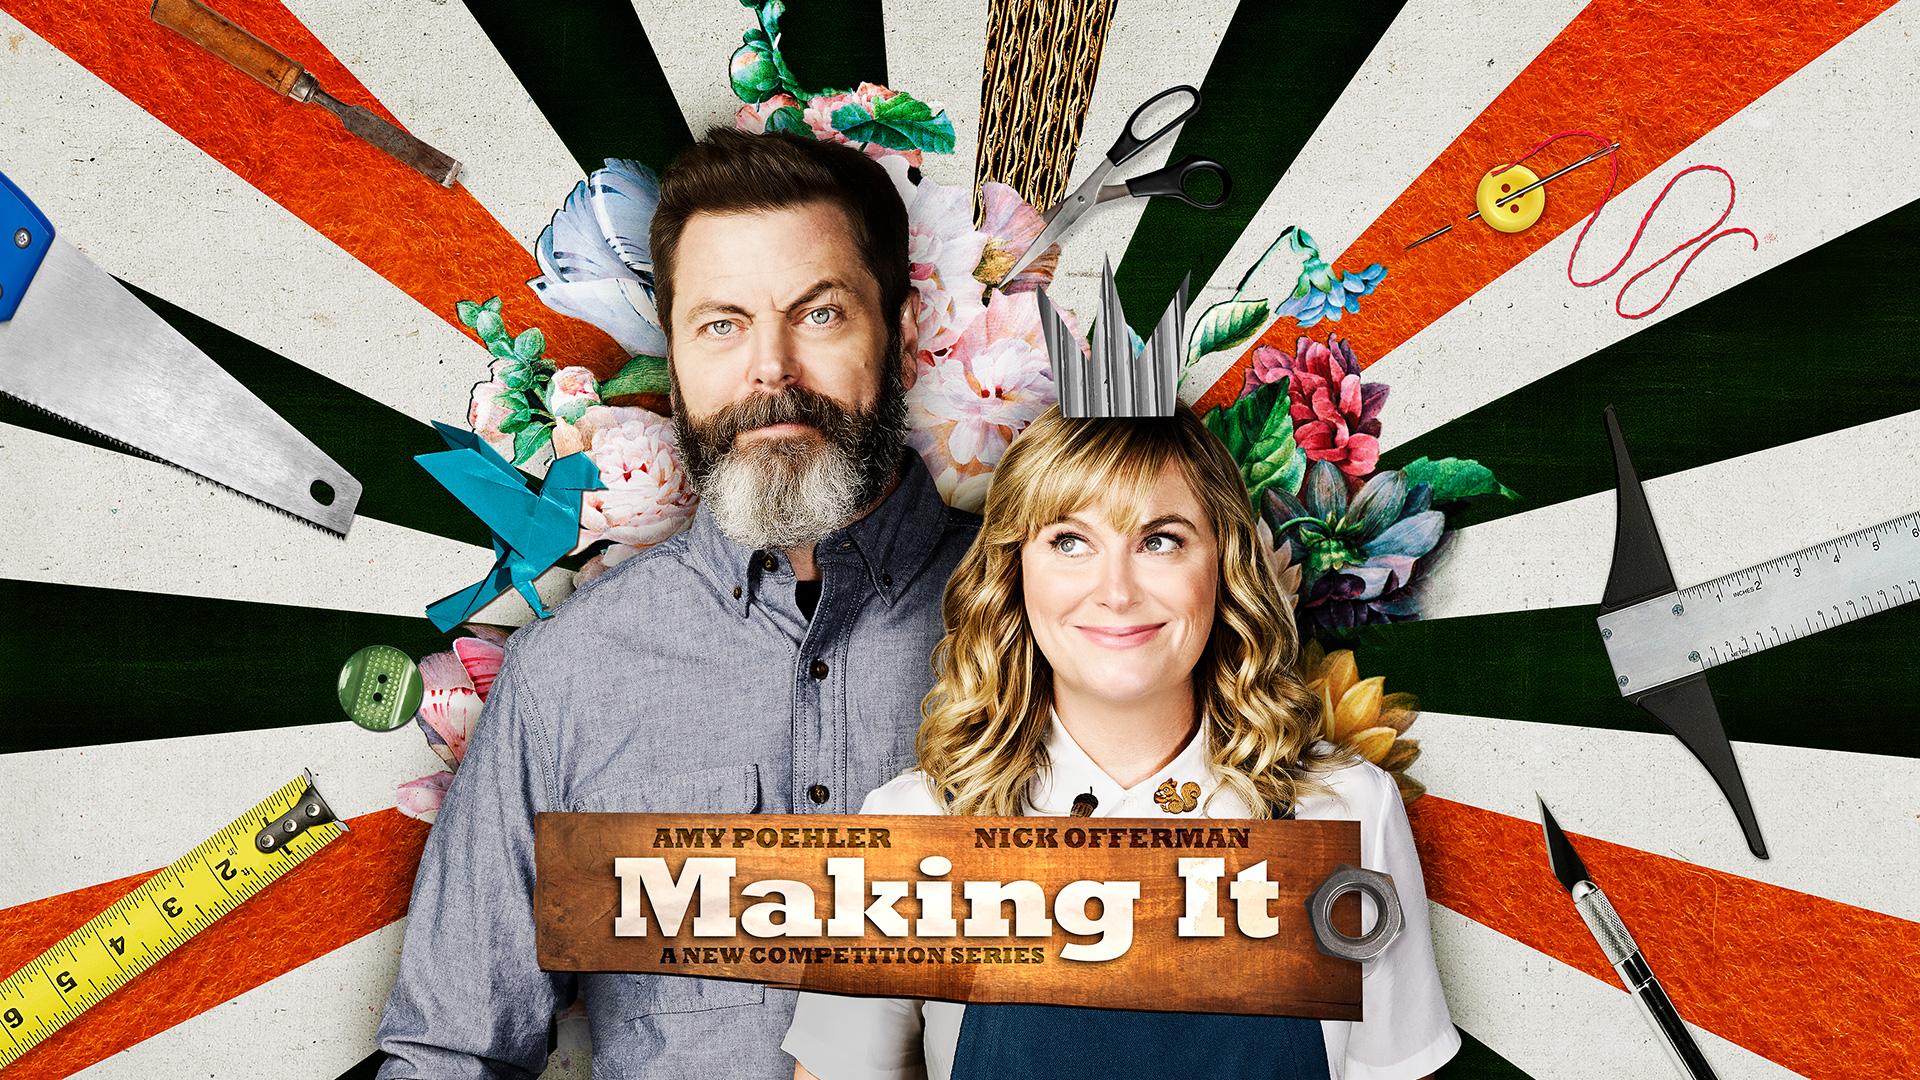 Making It Cast - NBC.com